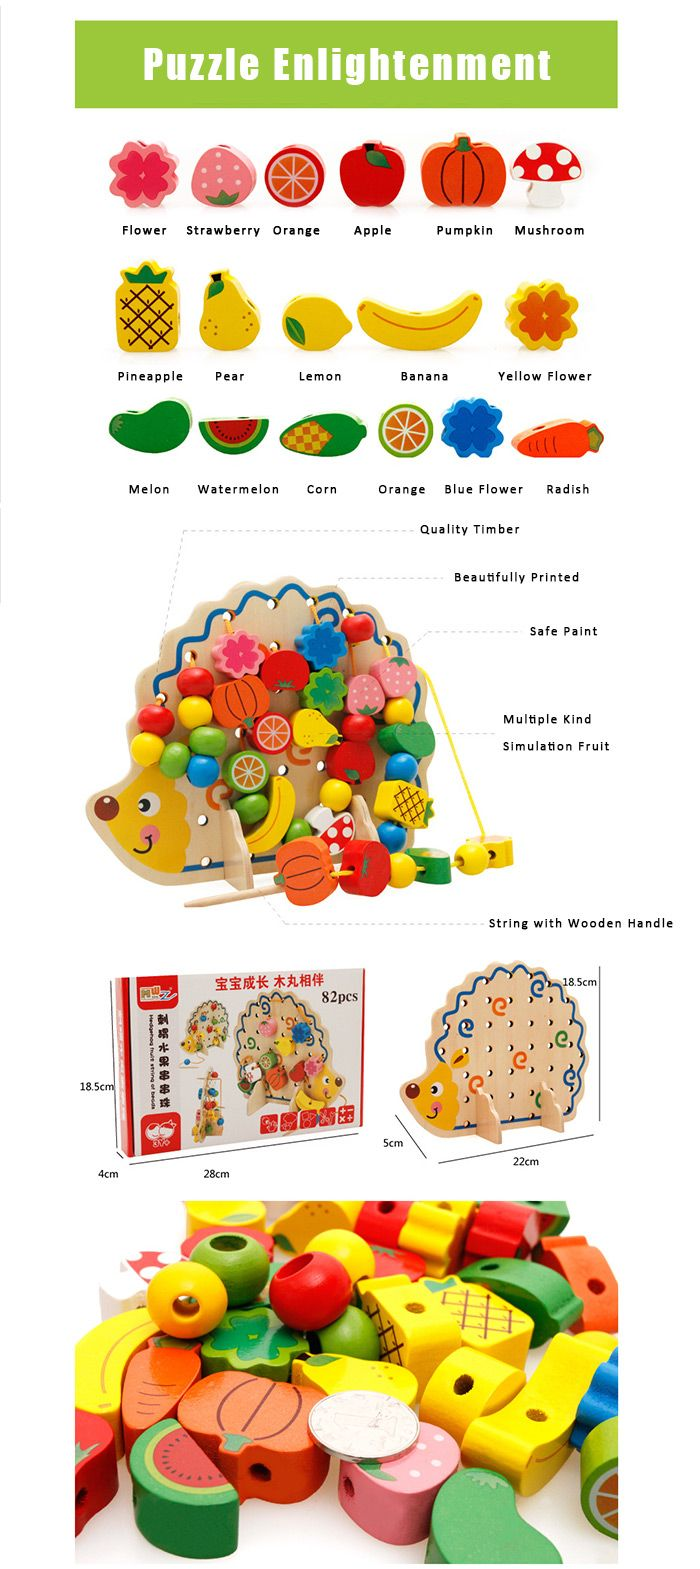 Hedgehog Fruit Stringing Bead Stackable Building Block Educational Toy for Children